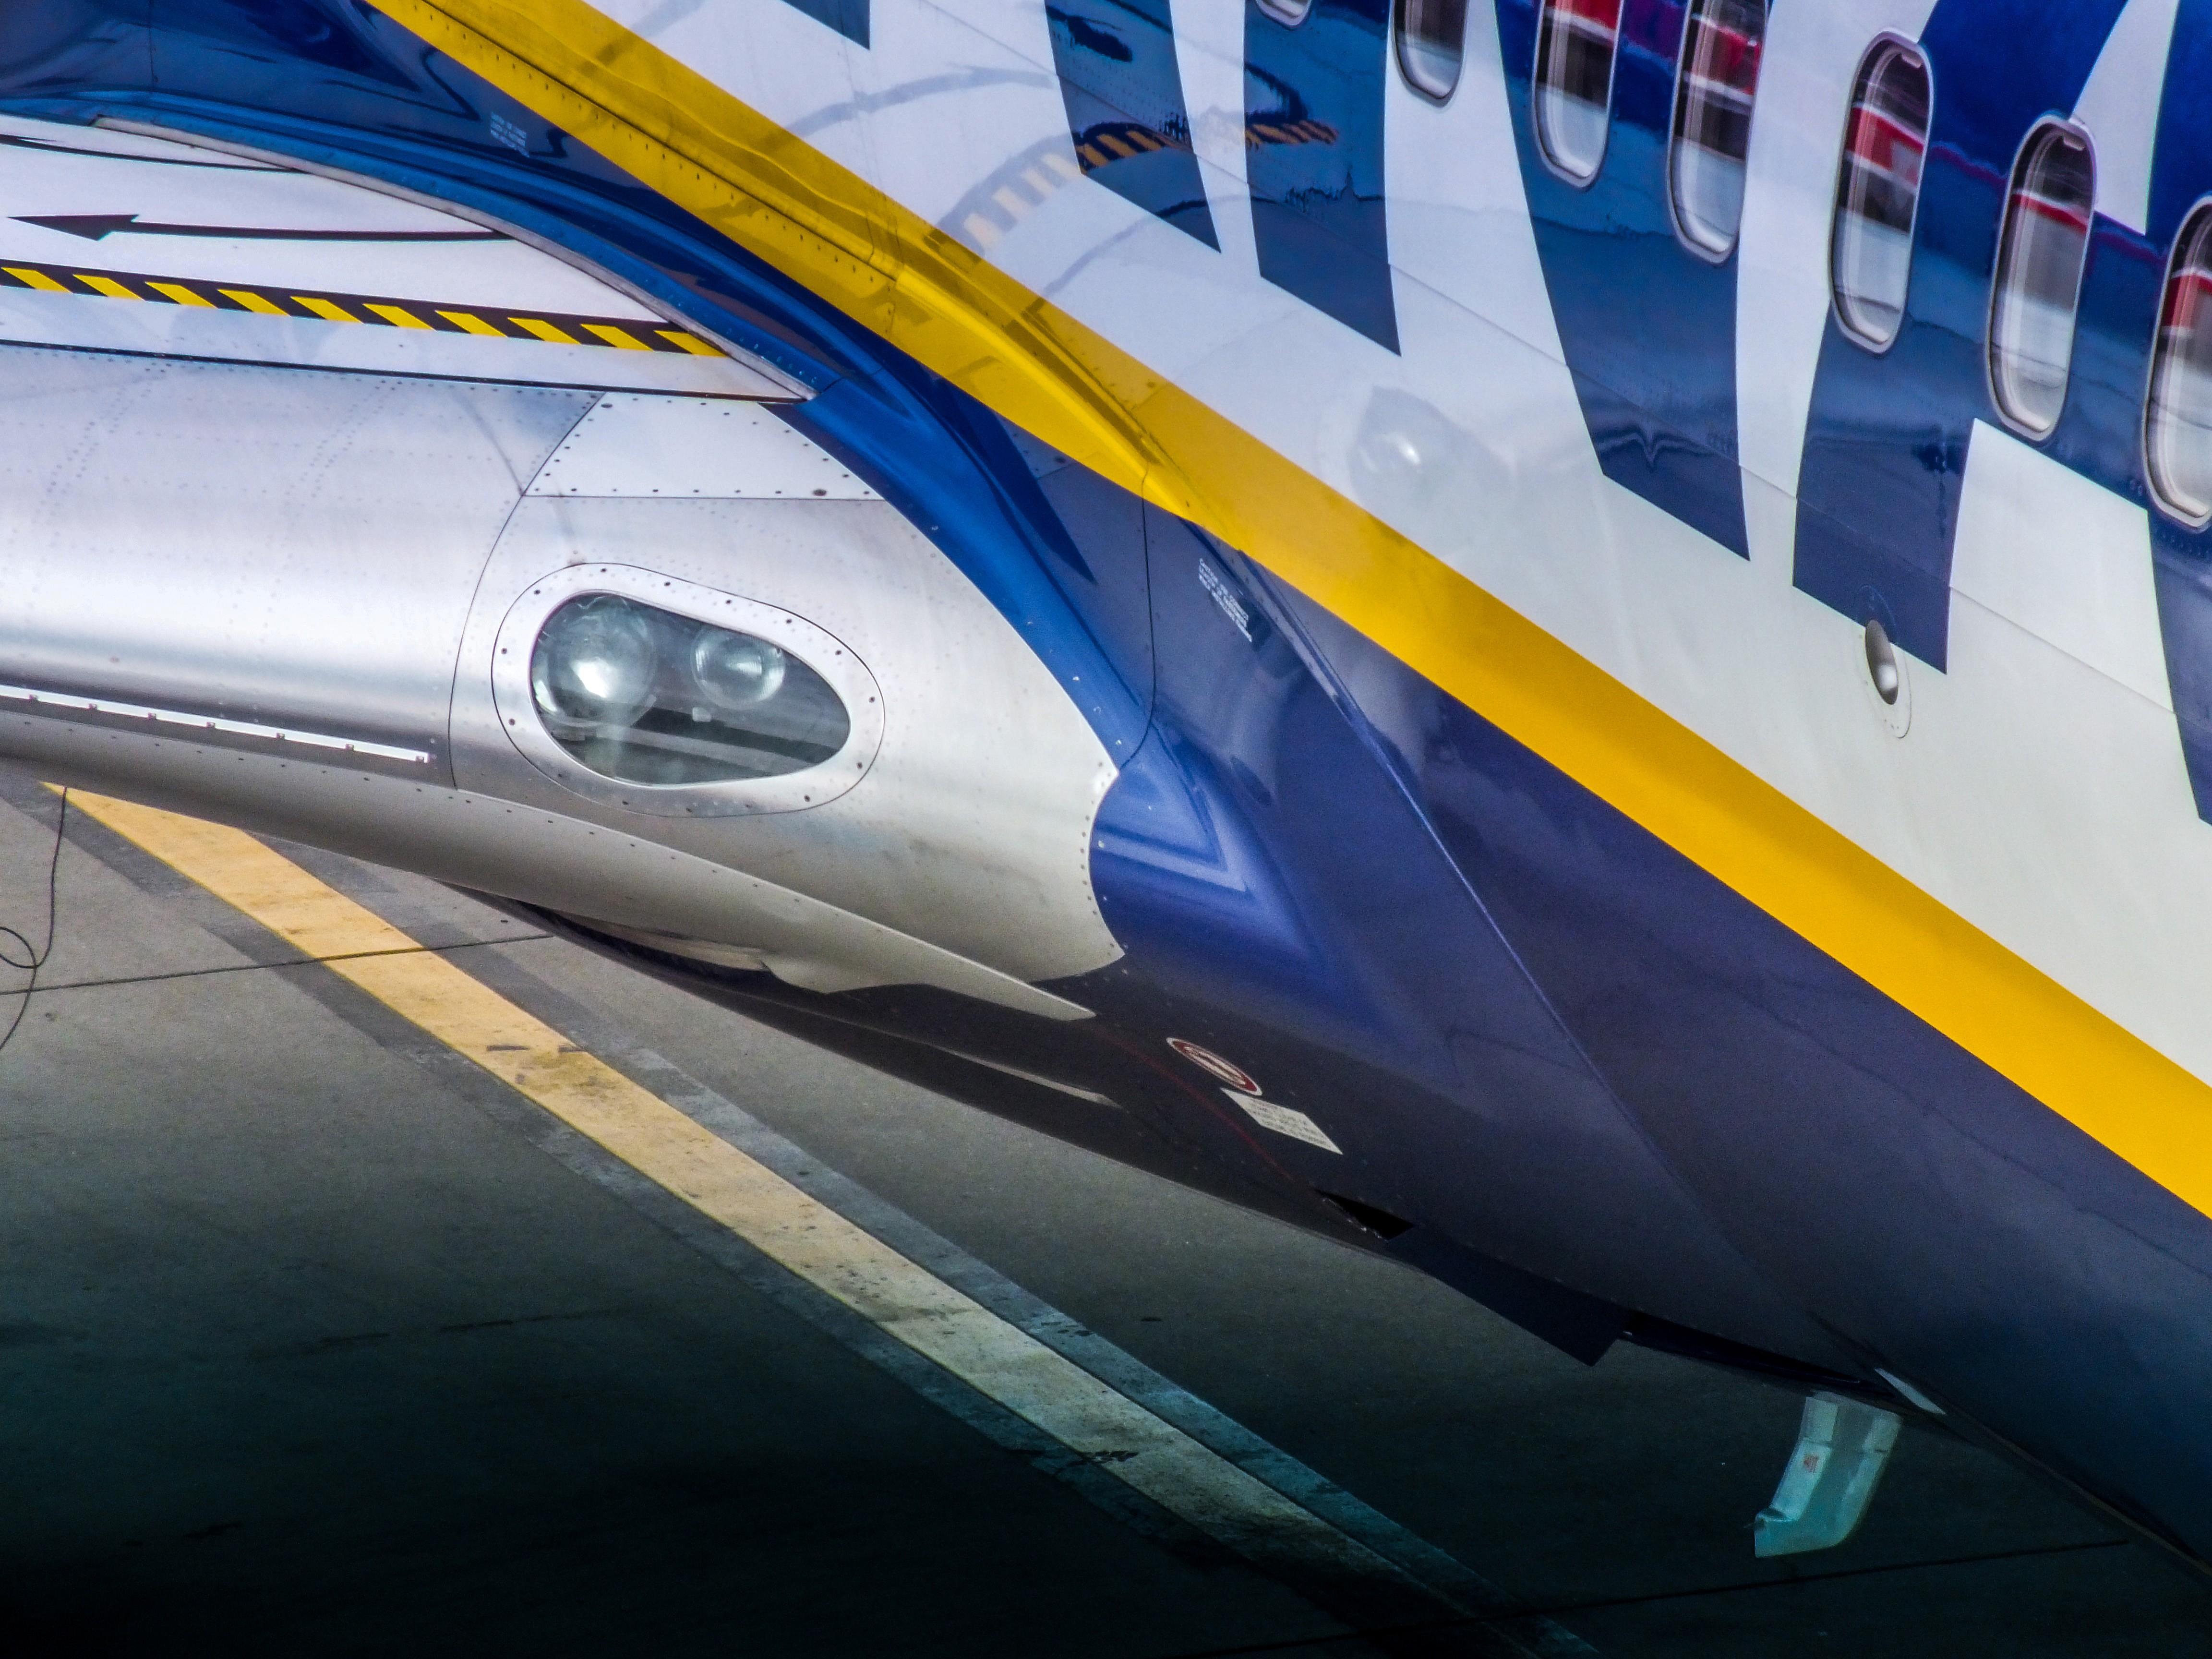 Ryanair Boeing 737, Krakow Balice Airport, Poland, Krakow, International, Polska, HQ Photo